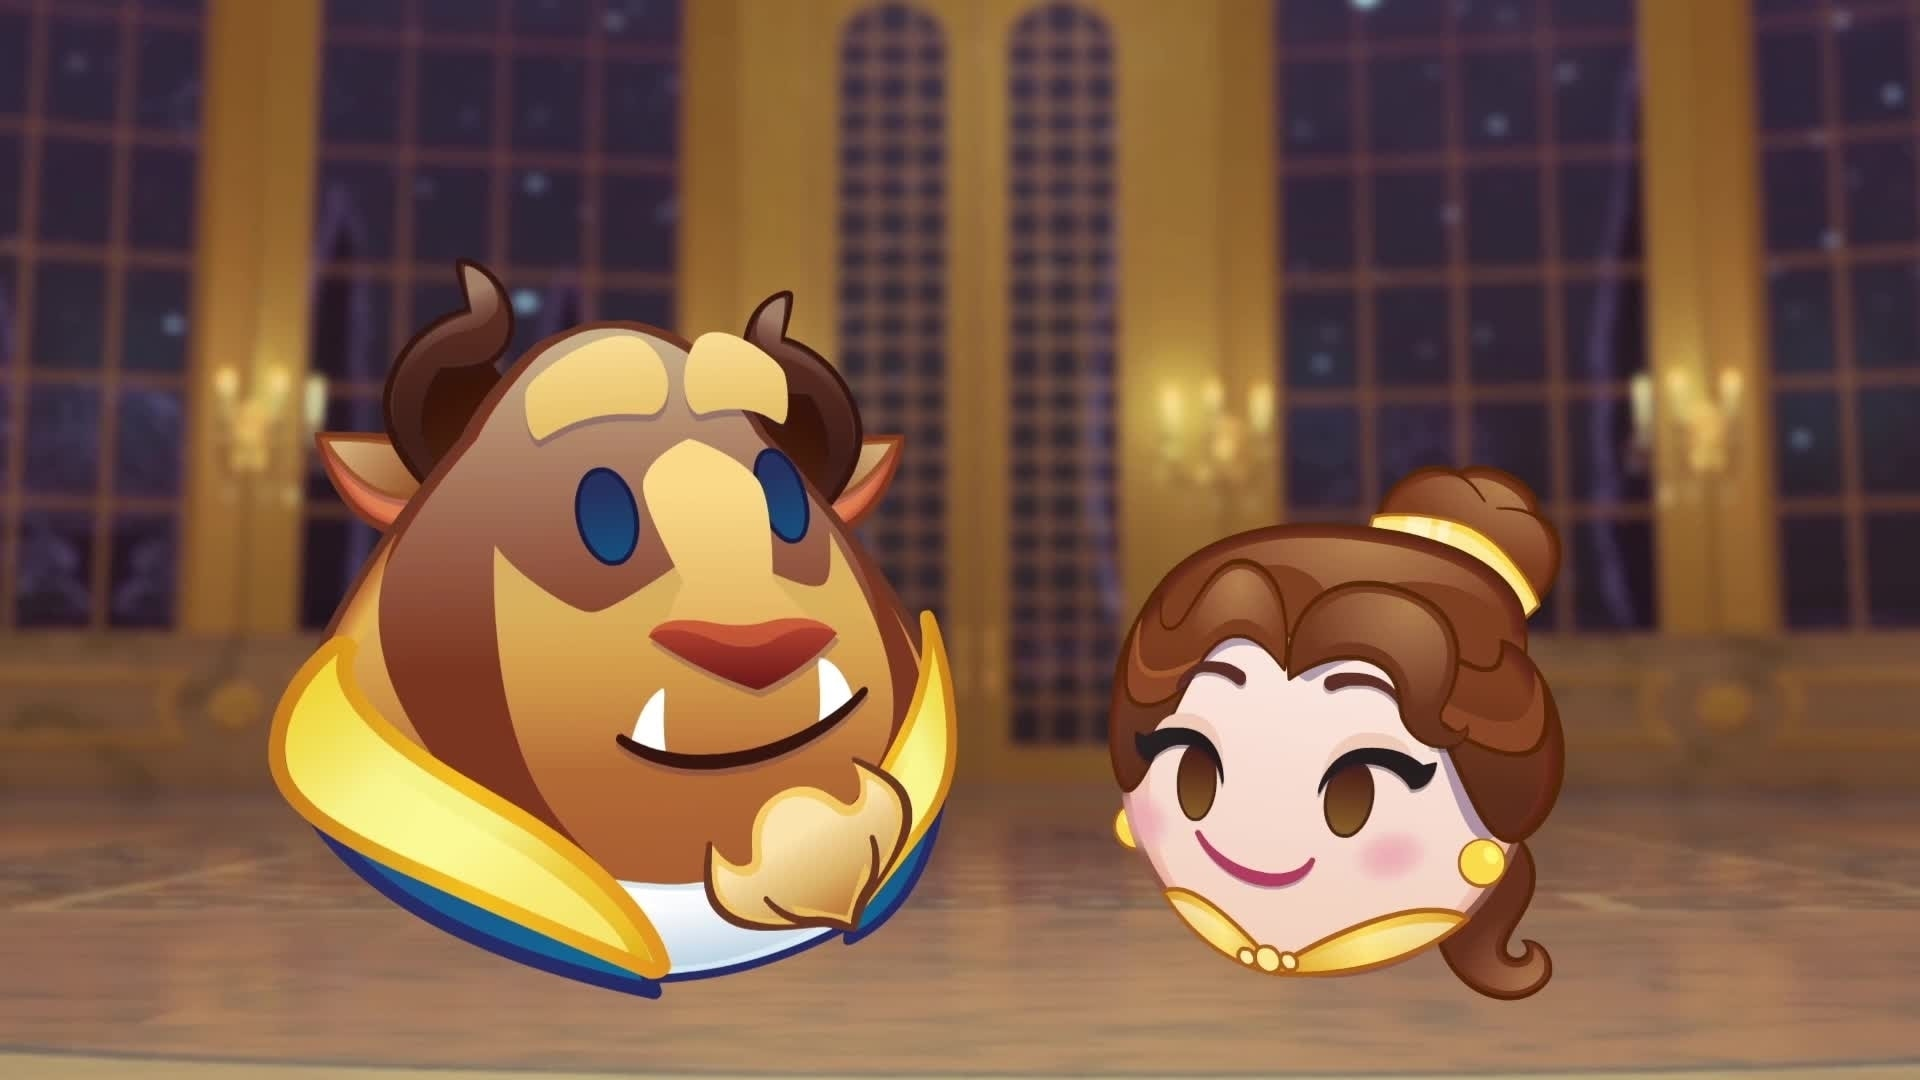 Disney Emojis - La Belle et la Bête